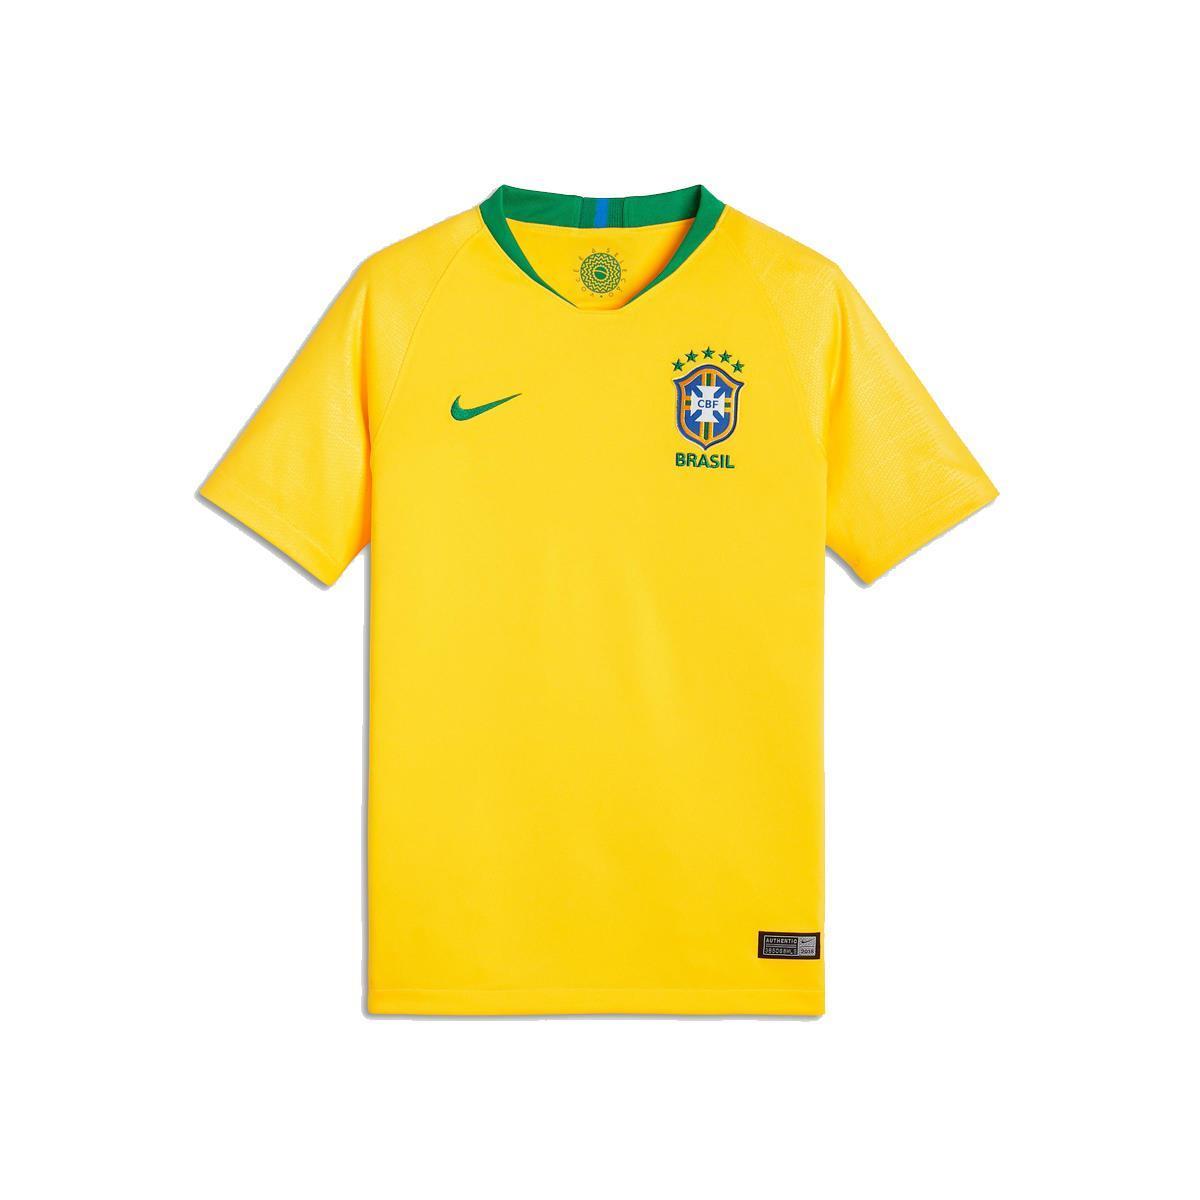 d26b17649 Camisa Nike Brasil 2018 19 Torcedor Réplica Infantil